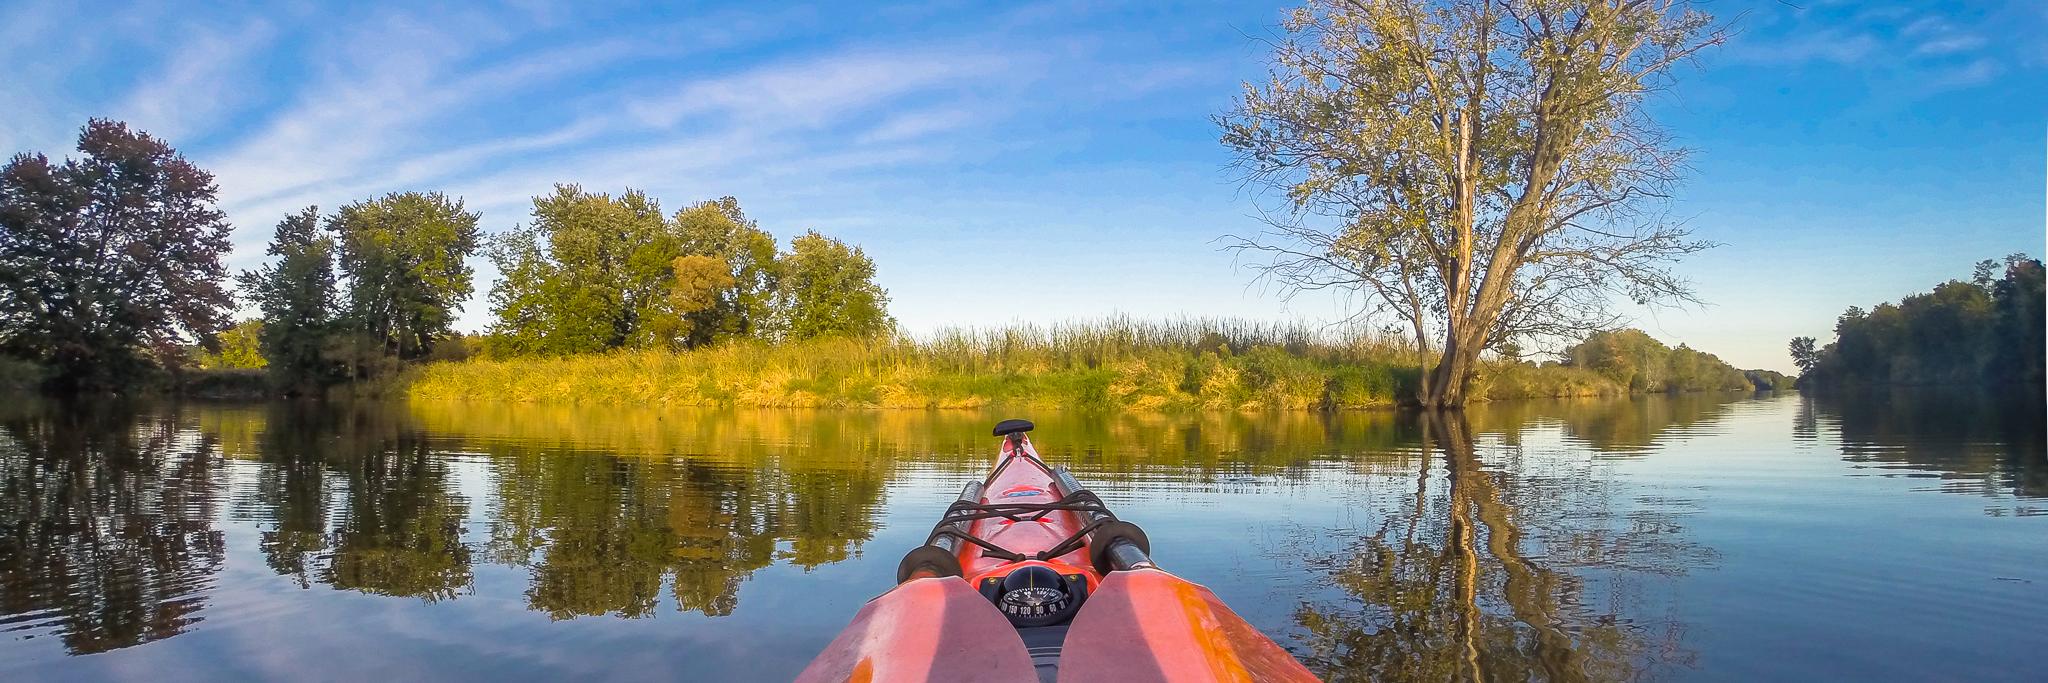 chip_macalpine_erie_canal_kayaking_87851